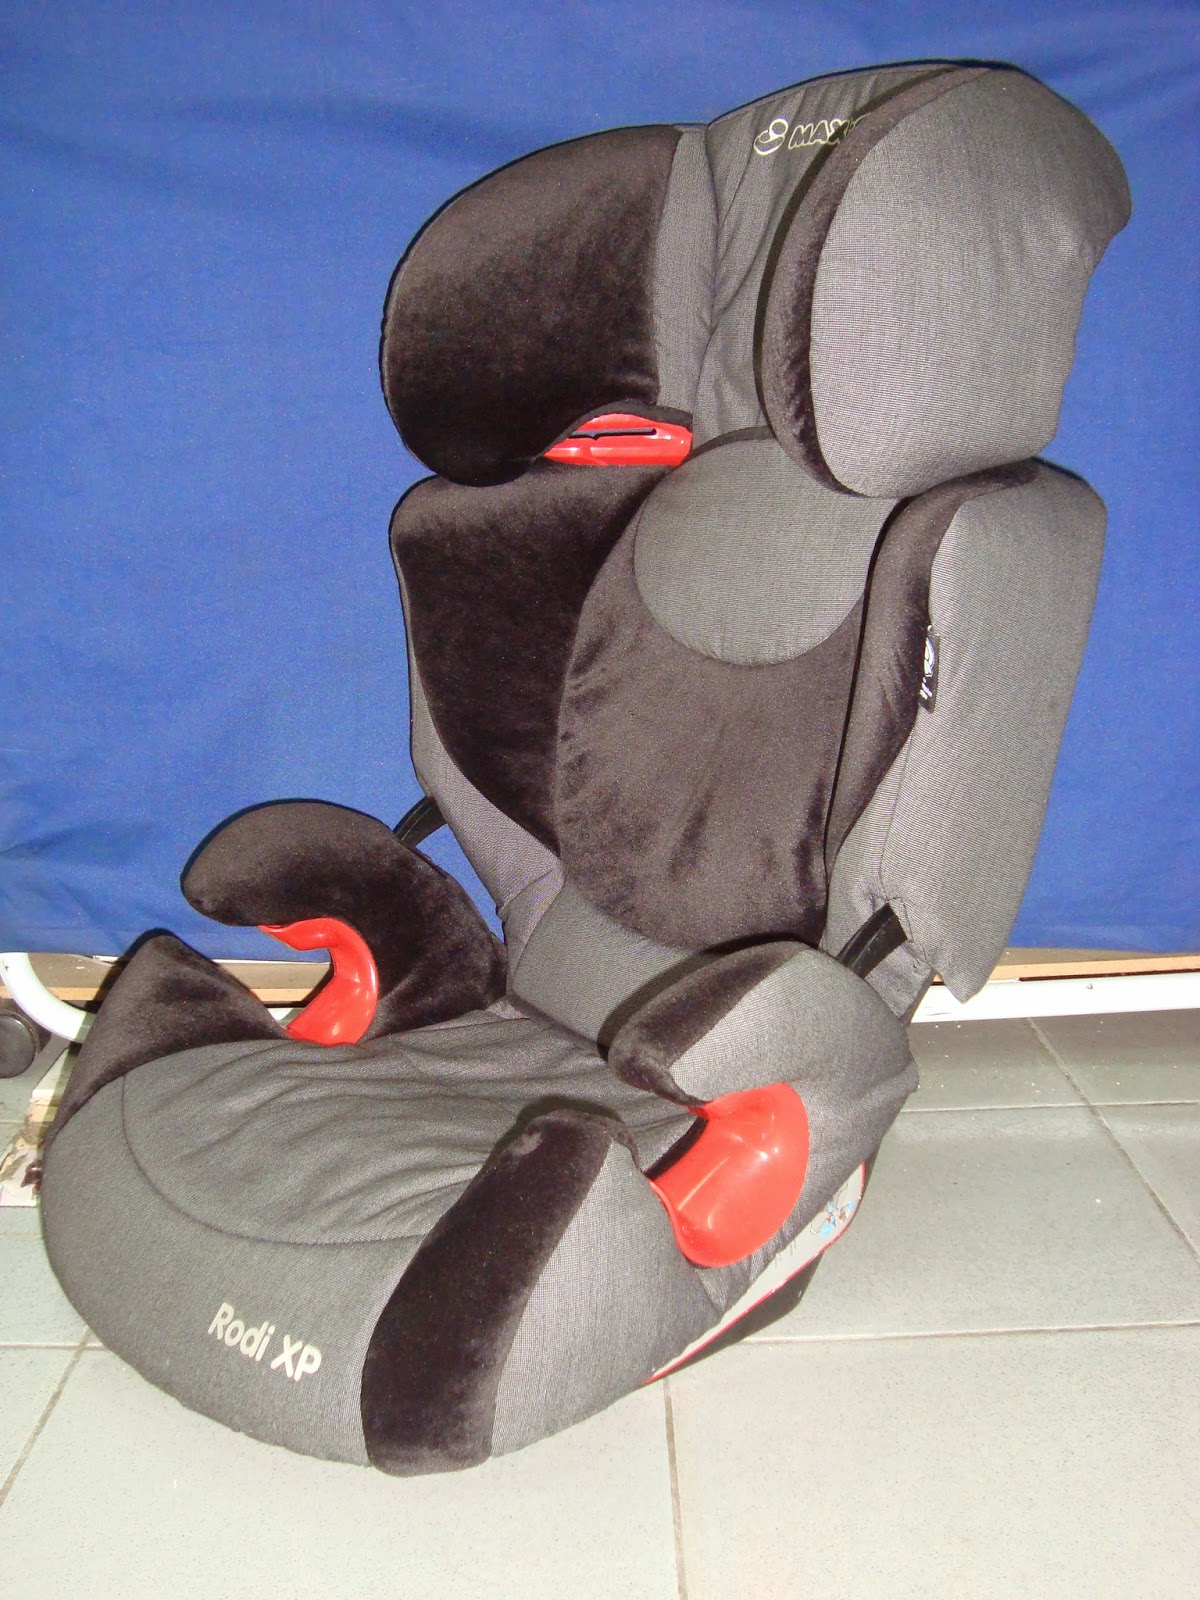 kedai bundle toys thetottoys maxi cosi rodi xp booster seat. Black Bedroom Furniture Sets. Home Design Ideas